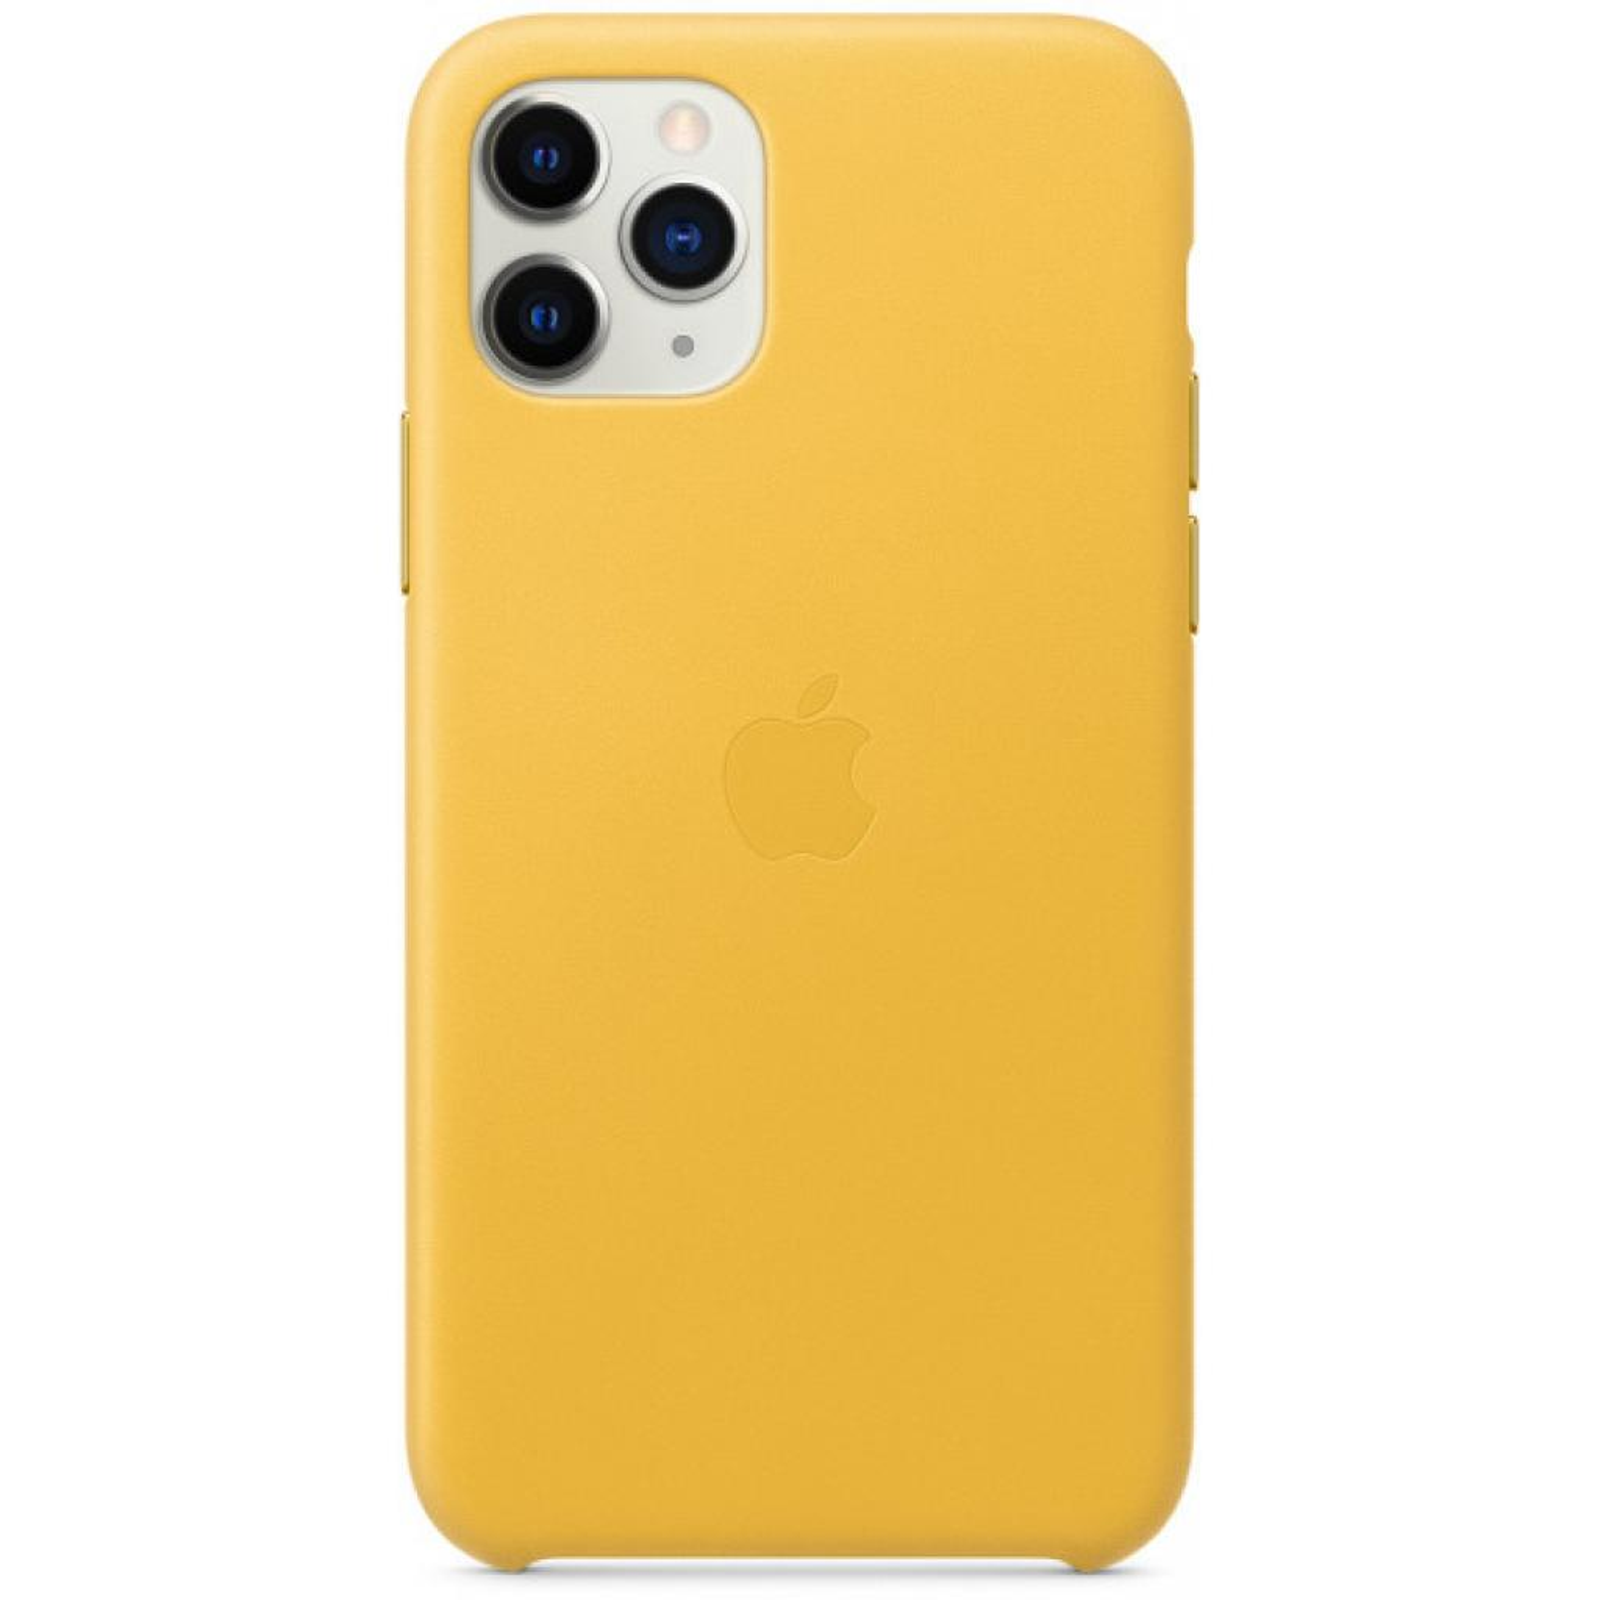 Чехол для моб. телефона Apple iPhone 11 Pro Leather Case - Midnight Blue (MWYG2ZM/A)